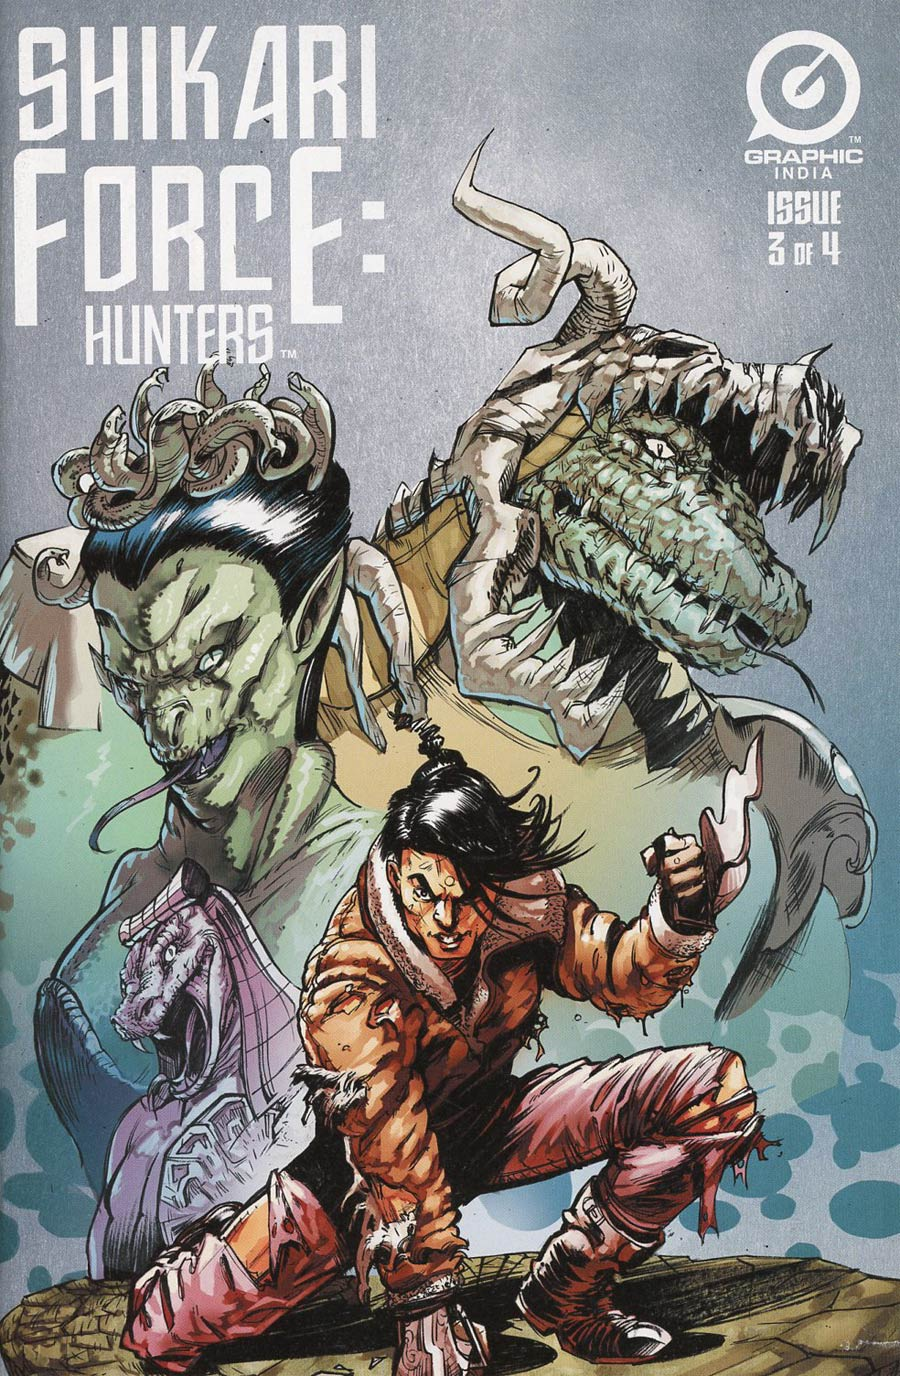 Shikari Force Hunters #3